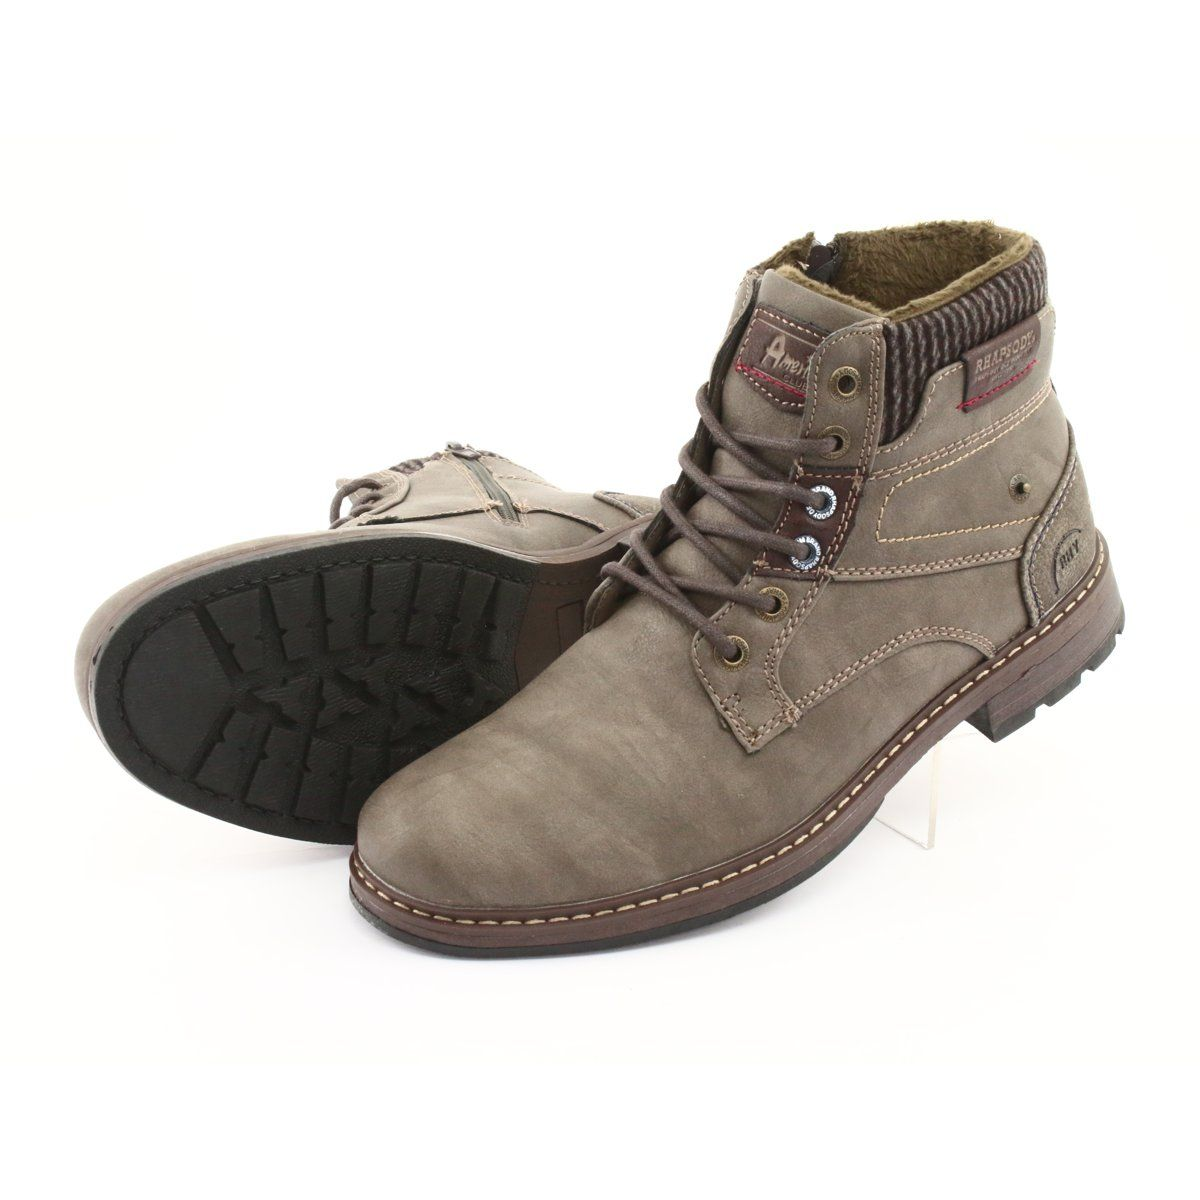 Botki Meskie American Club Rh31 Braz Brazowe Mens Boots Casual Boots Men Boots